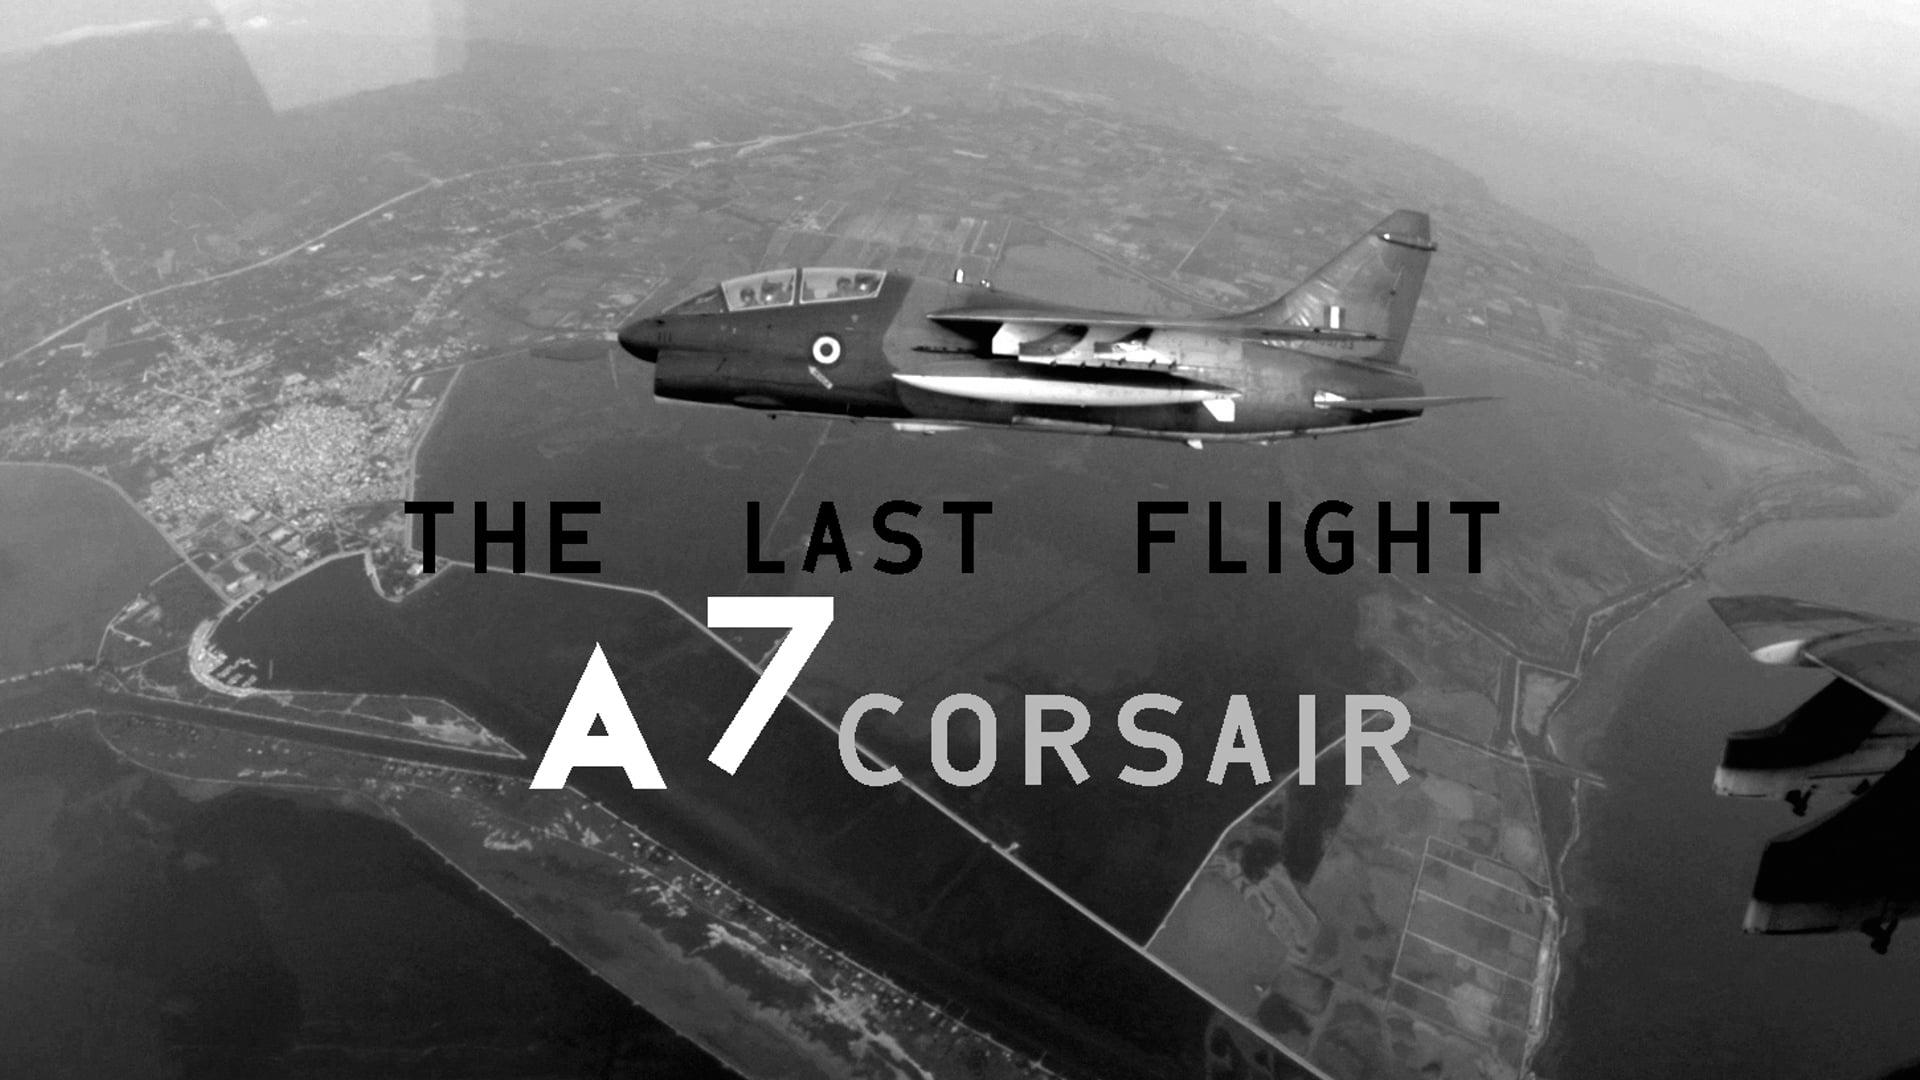 The Last Flight | A7 Corsair